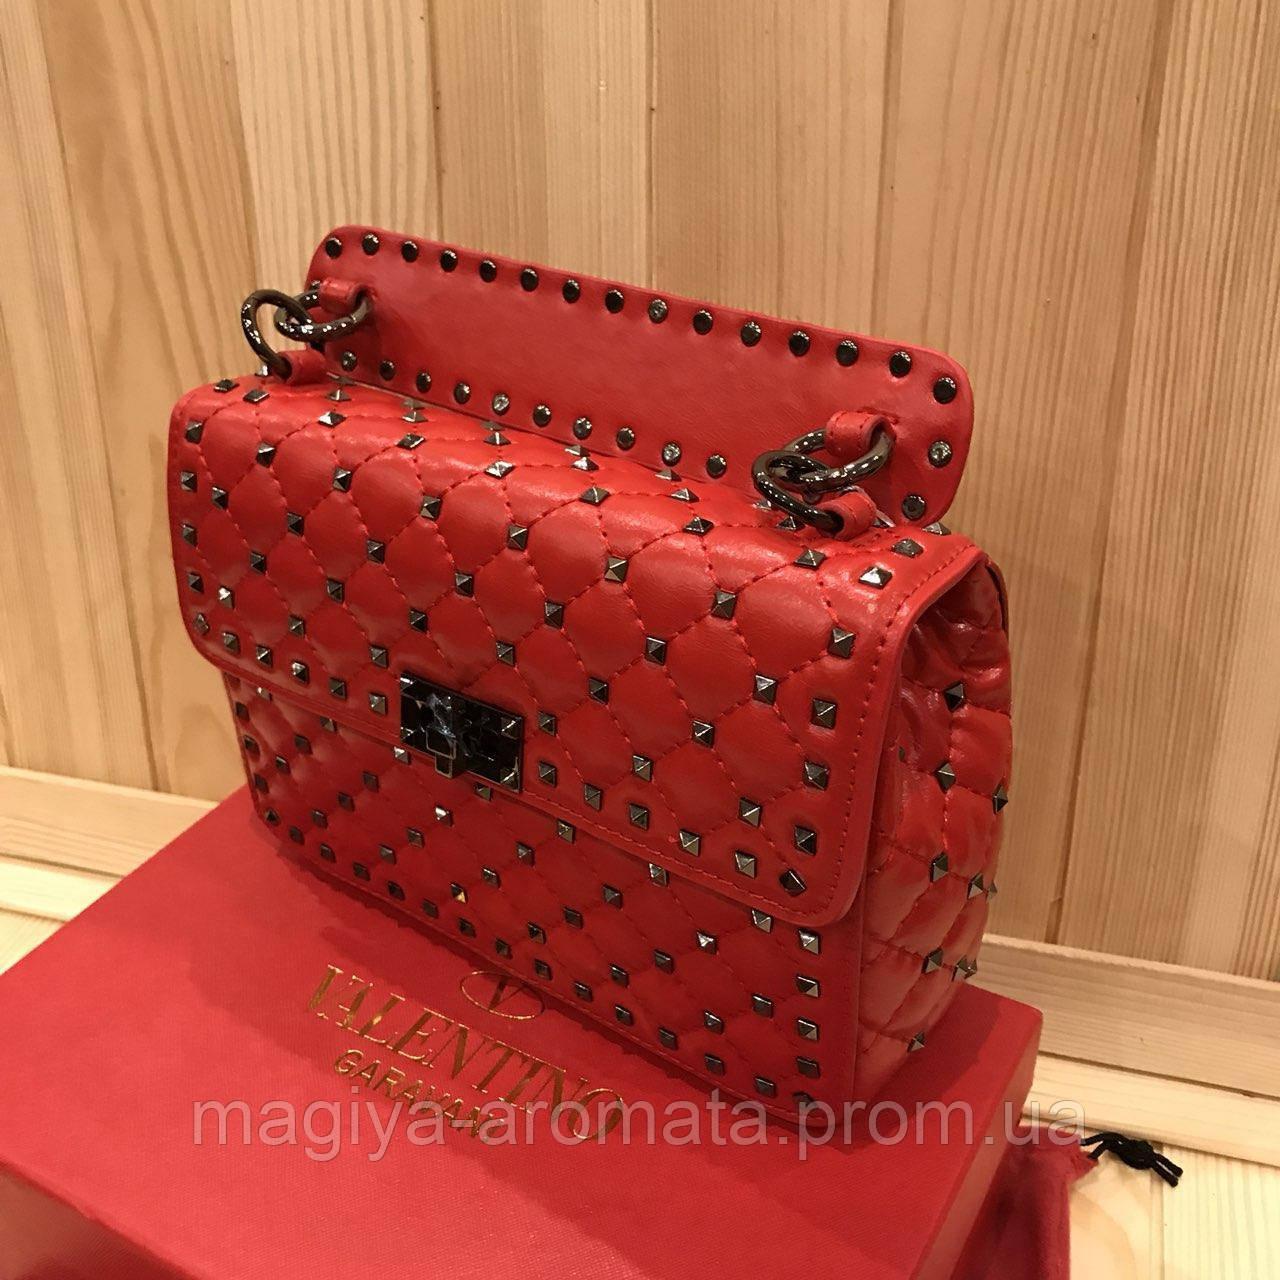 da975e02cbab Женская кожаная сумка Valentino Garavani Rockstud Spike medium Цвет красный  - Магия Аромата - Парфюмерия,